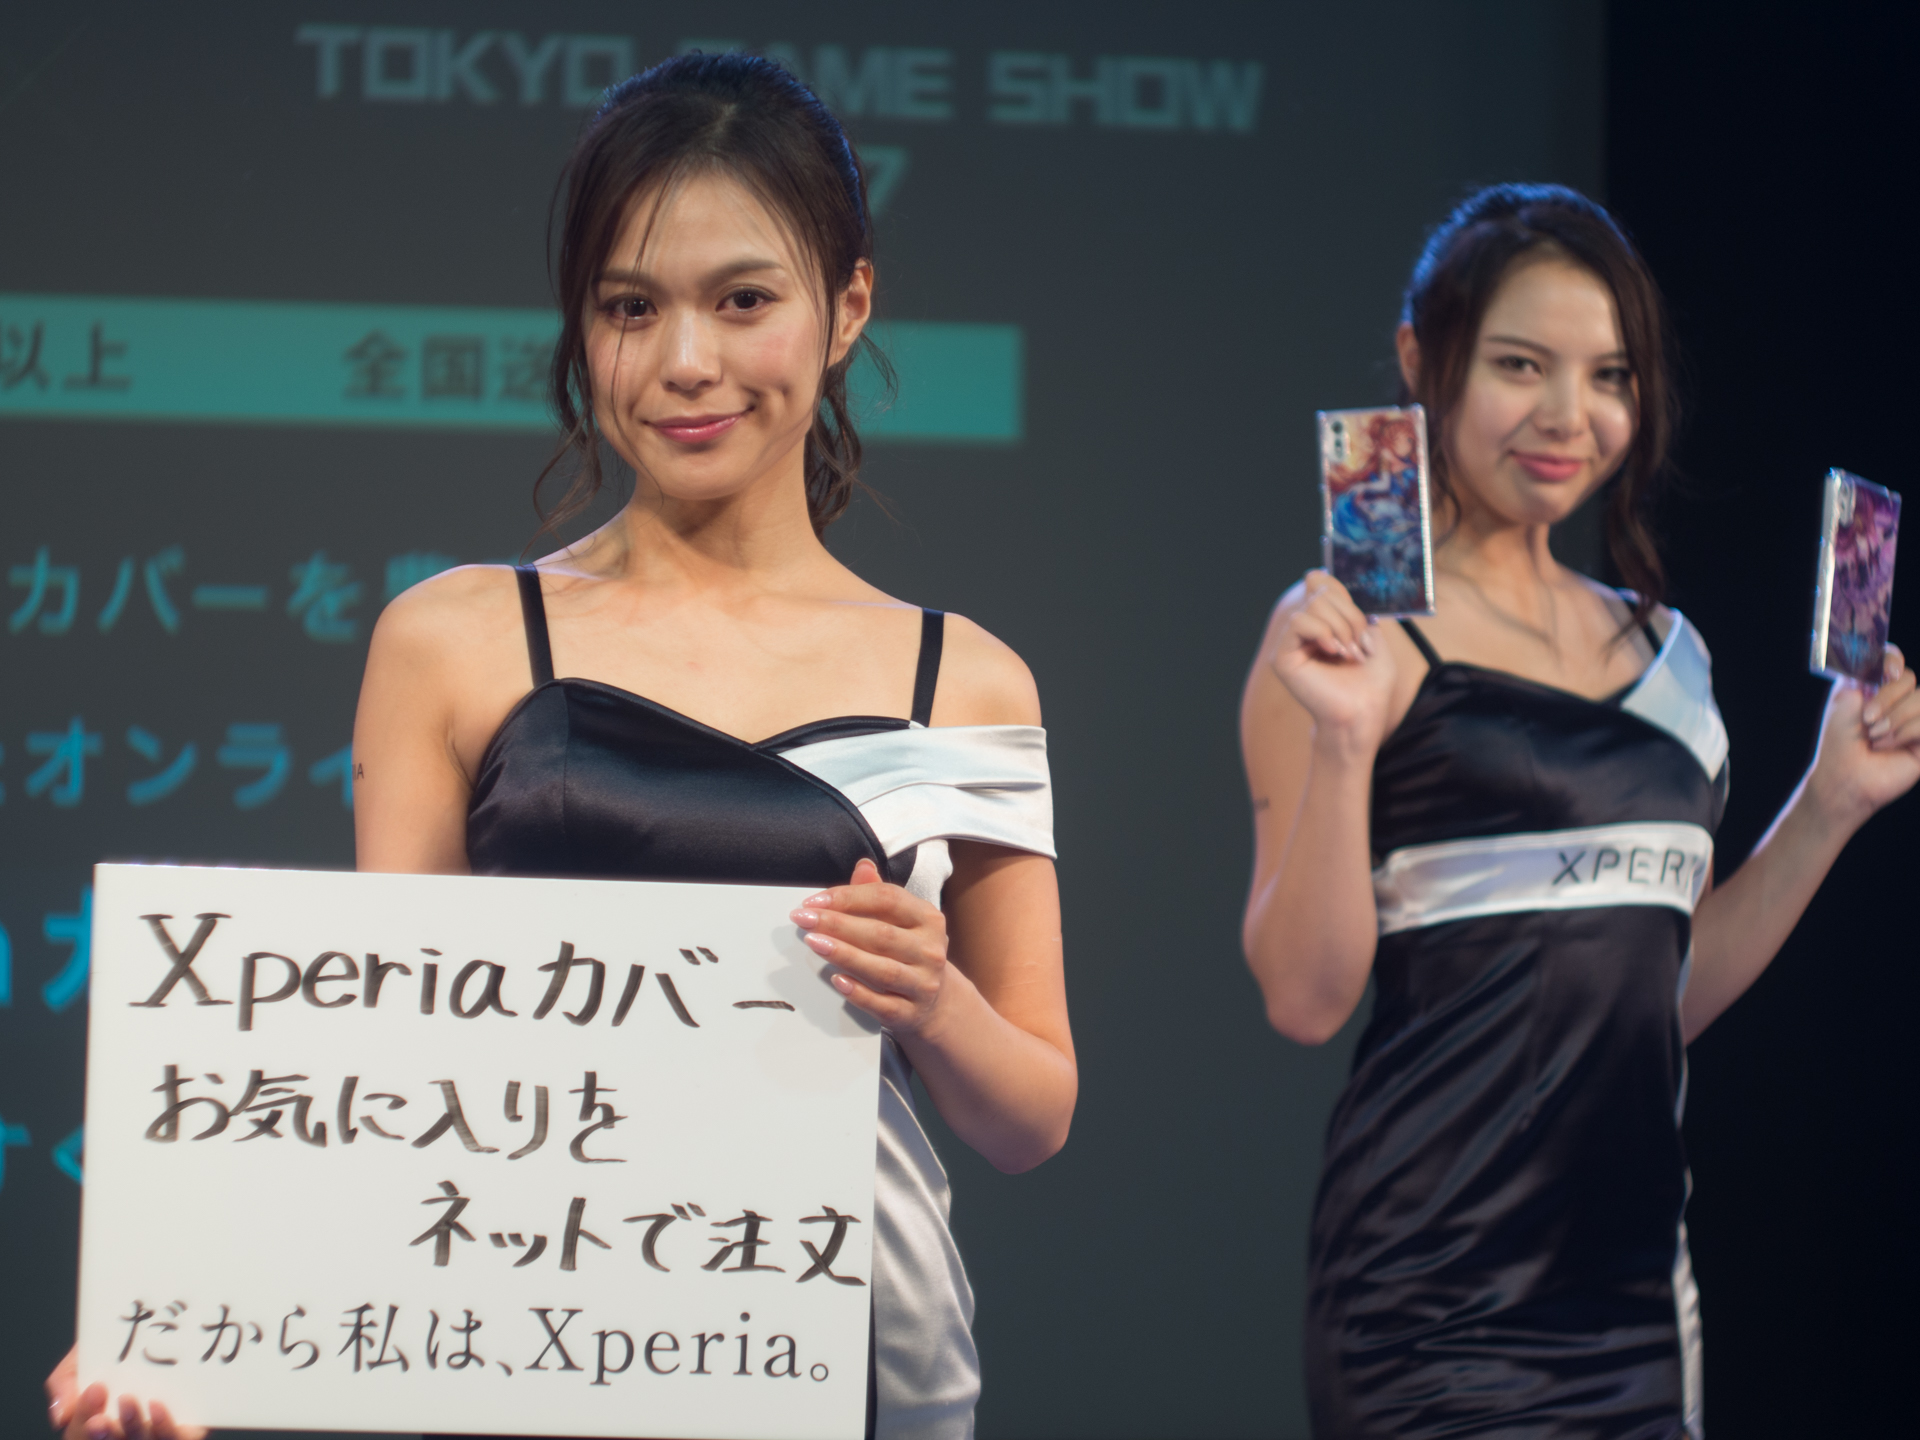 Xperia 東京ゲームショウ2017